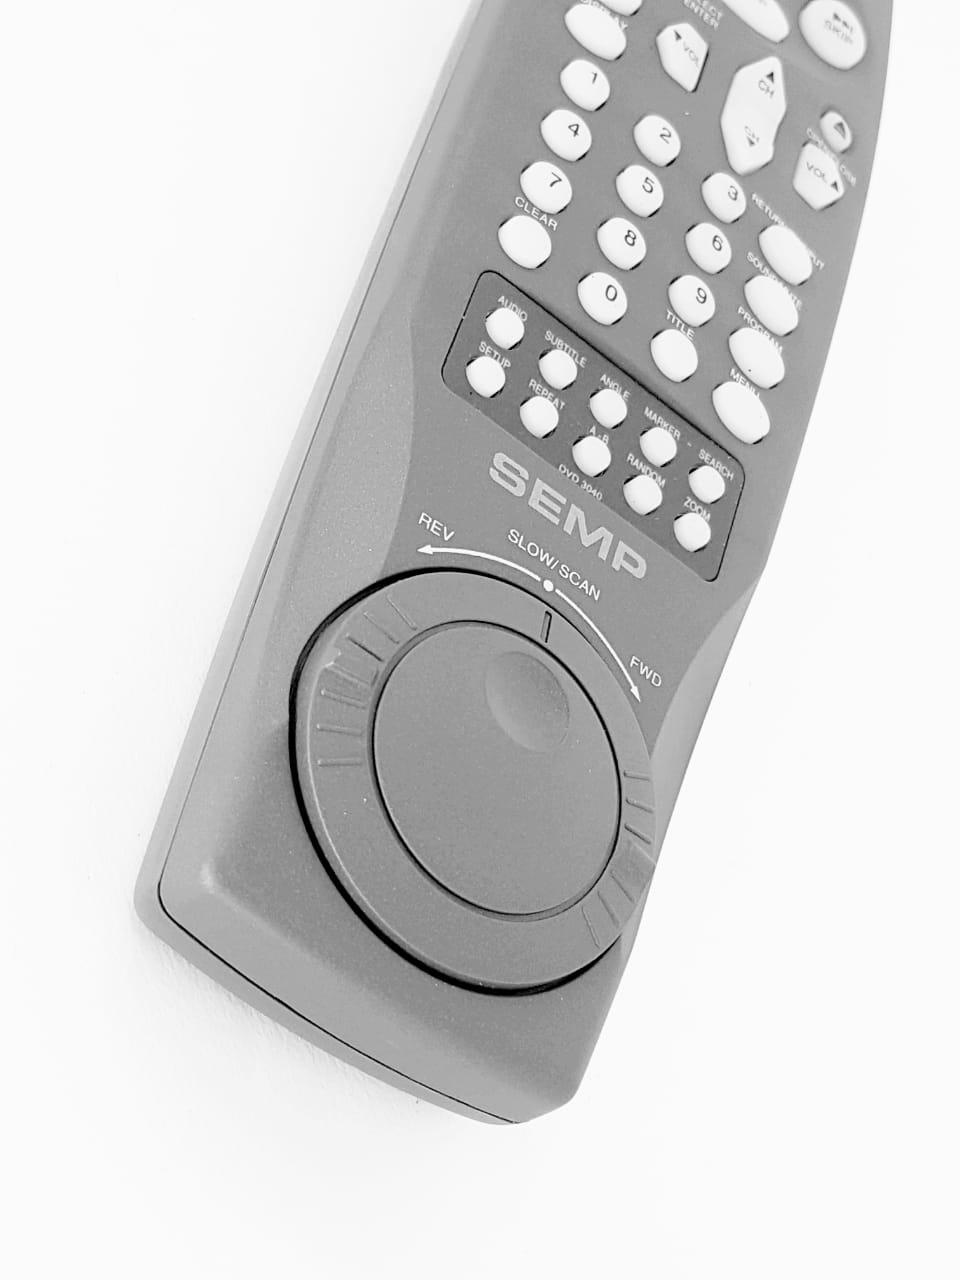 Controle Remoto Dvd Semp Toshiba Dvd 3040 Novo Cinza